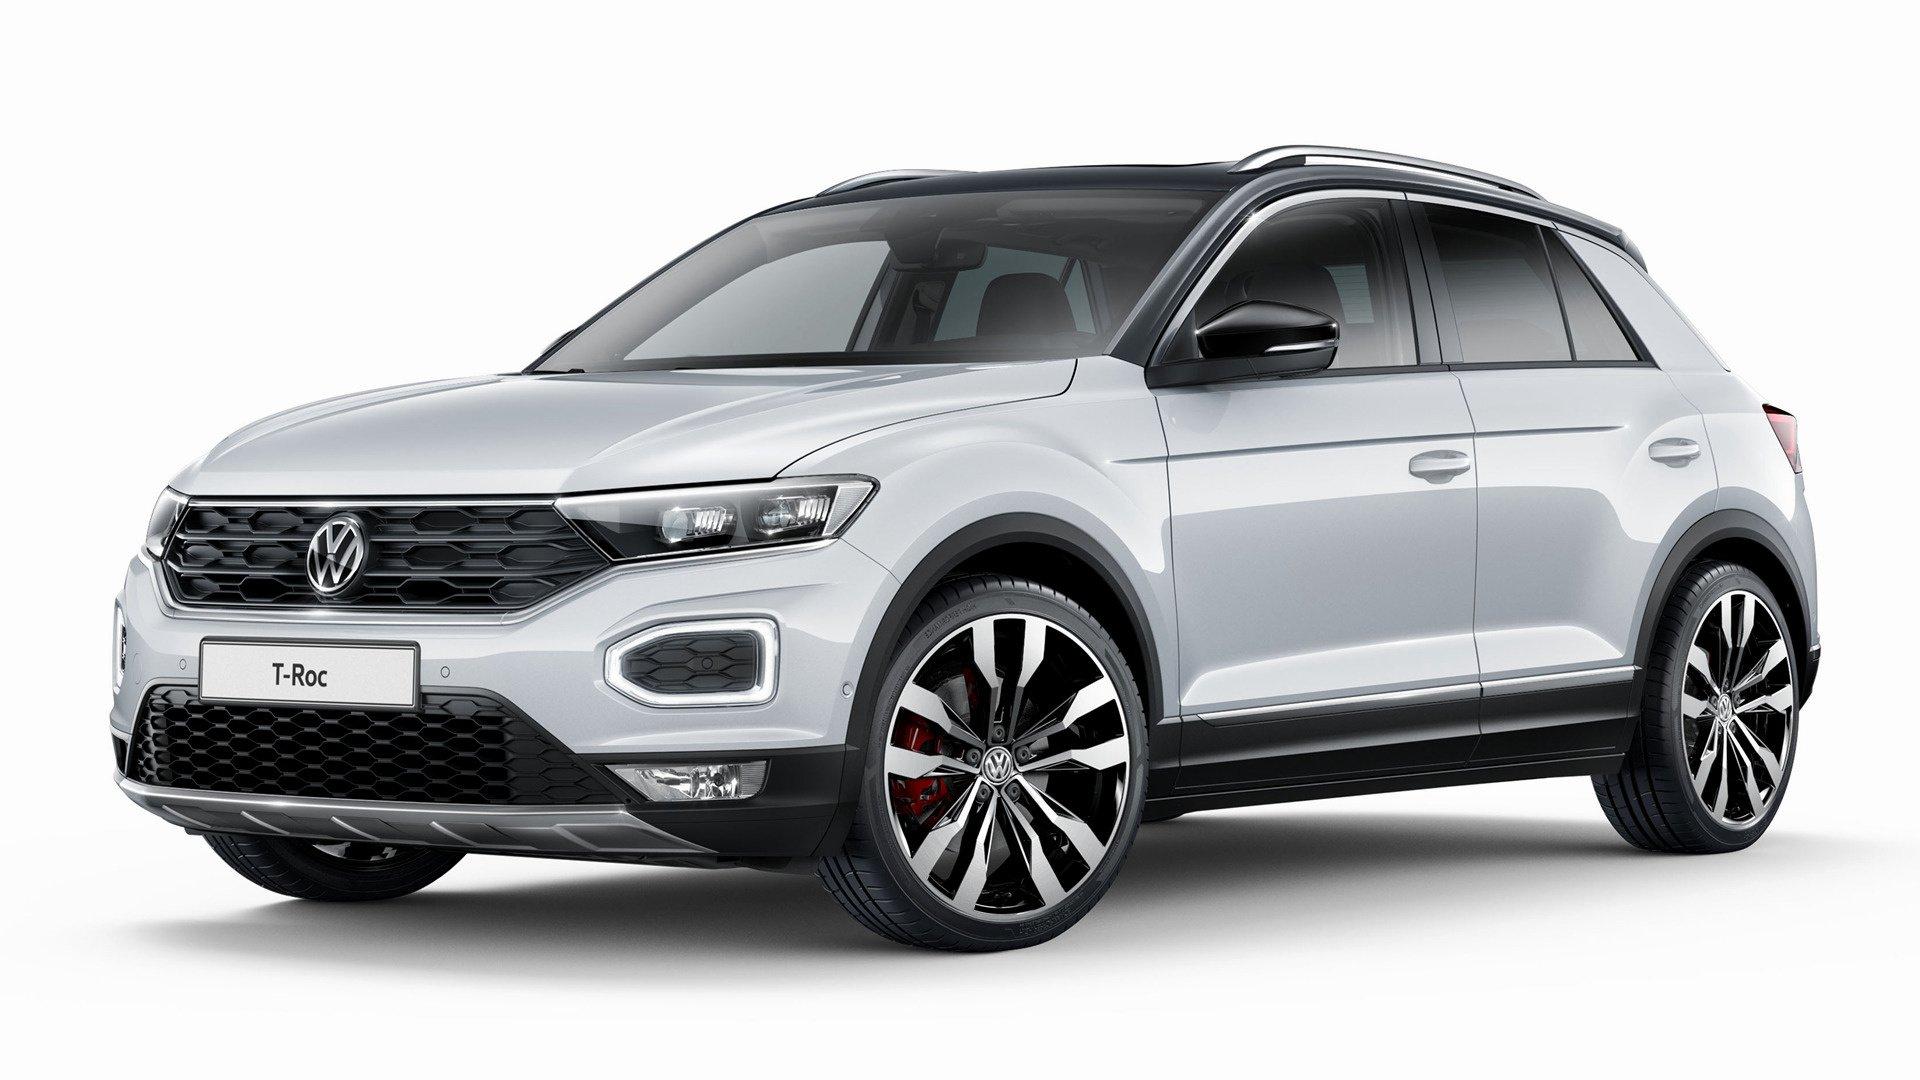 Volkswagen Fife On Twitter Quot T Roc R Line Will Open For